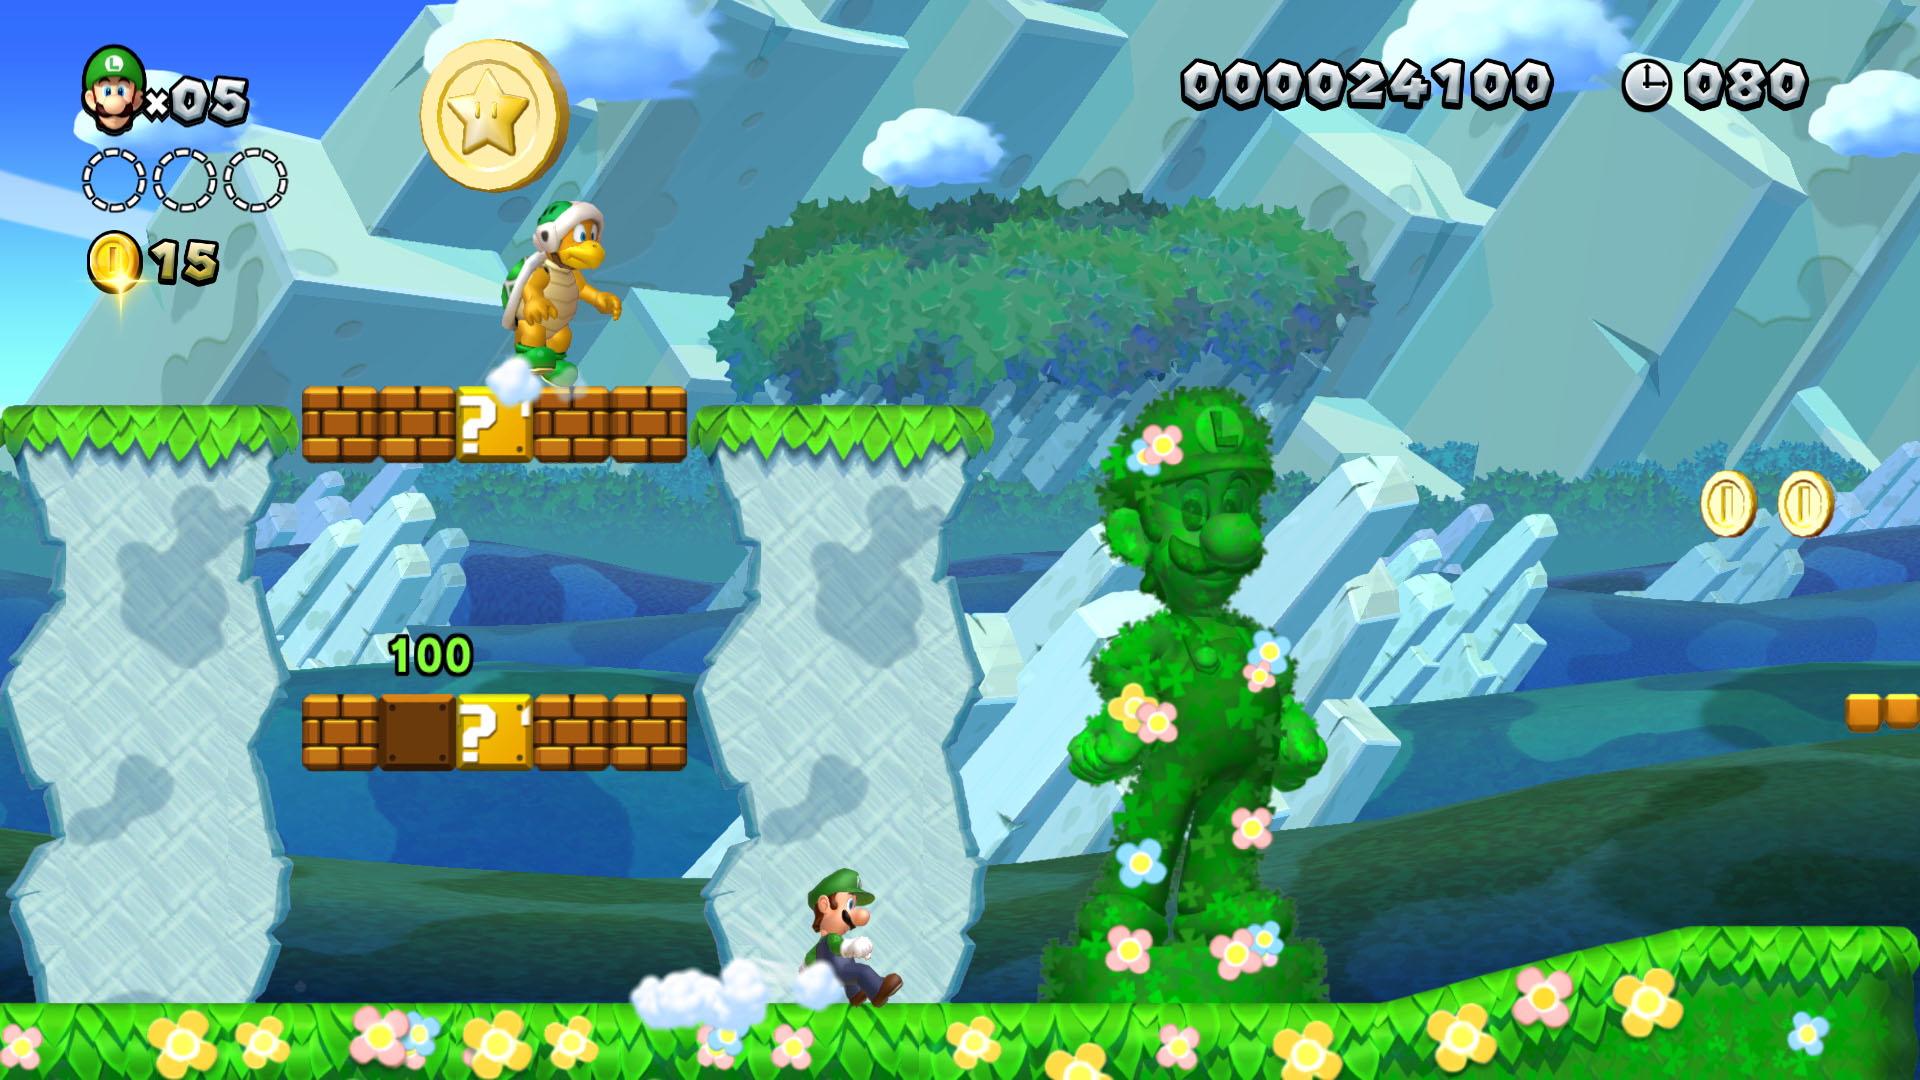 New Super Mario Bros U Deluxe Secret Exits: How To Find All Secret